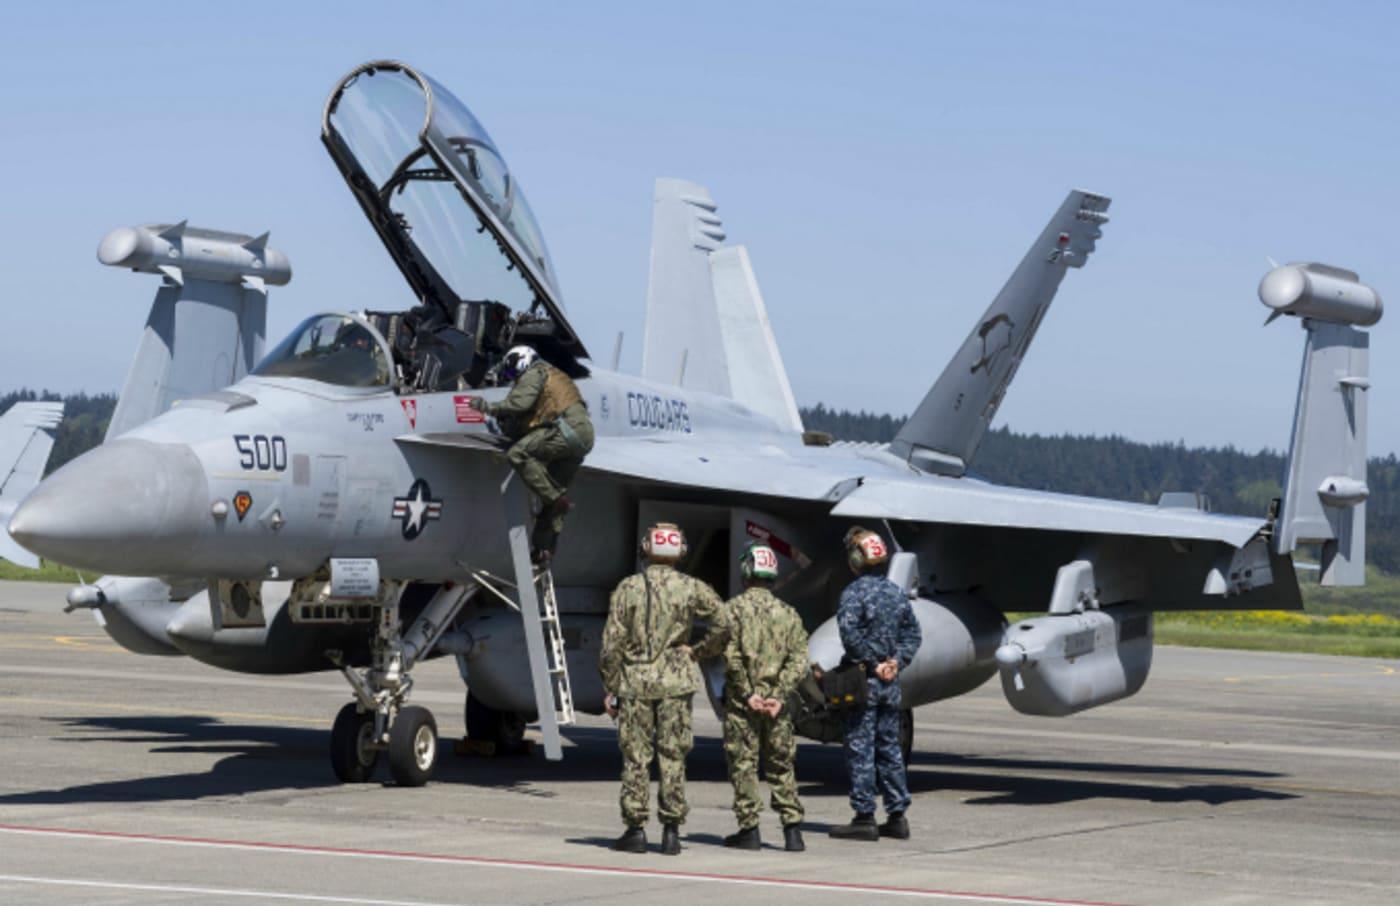 Three technicians watching as pilot climbs to his EA 18G Growler aircraft